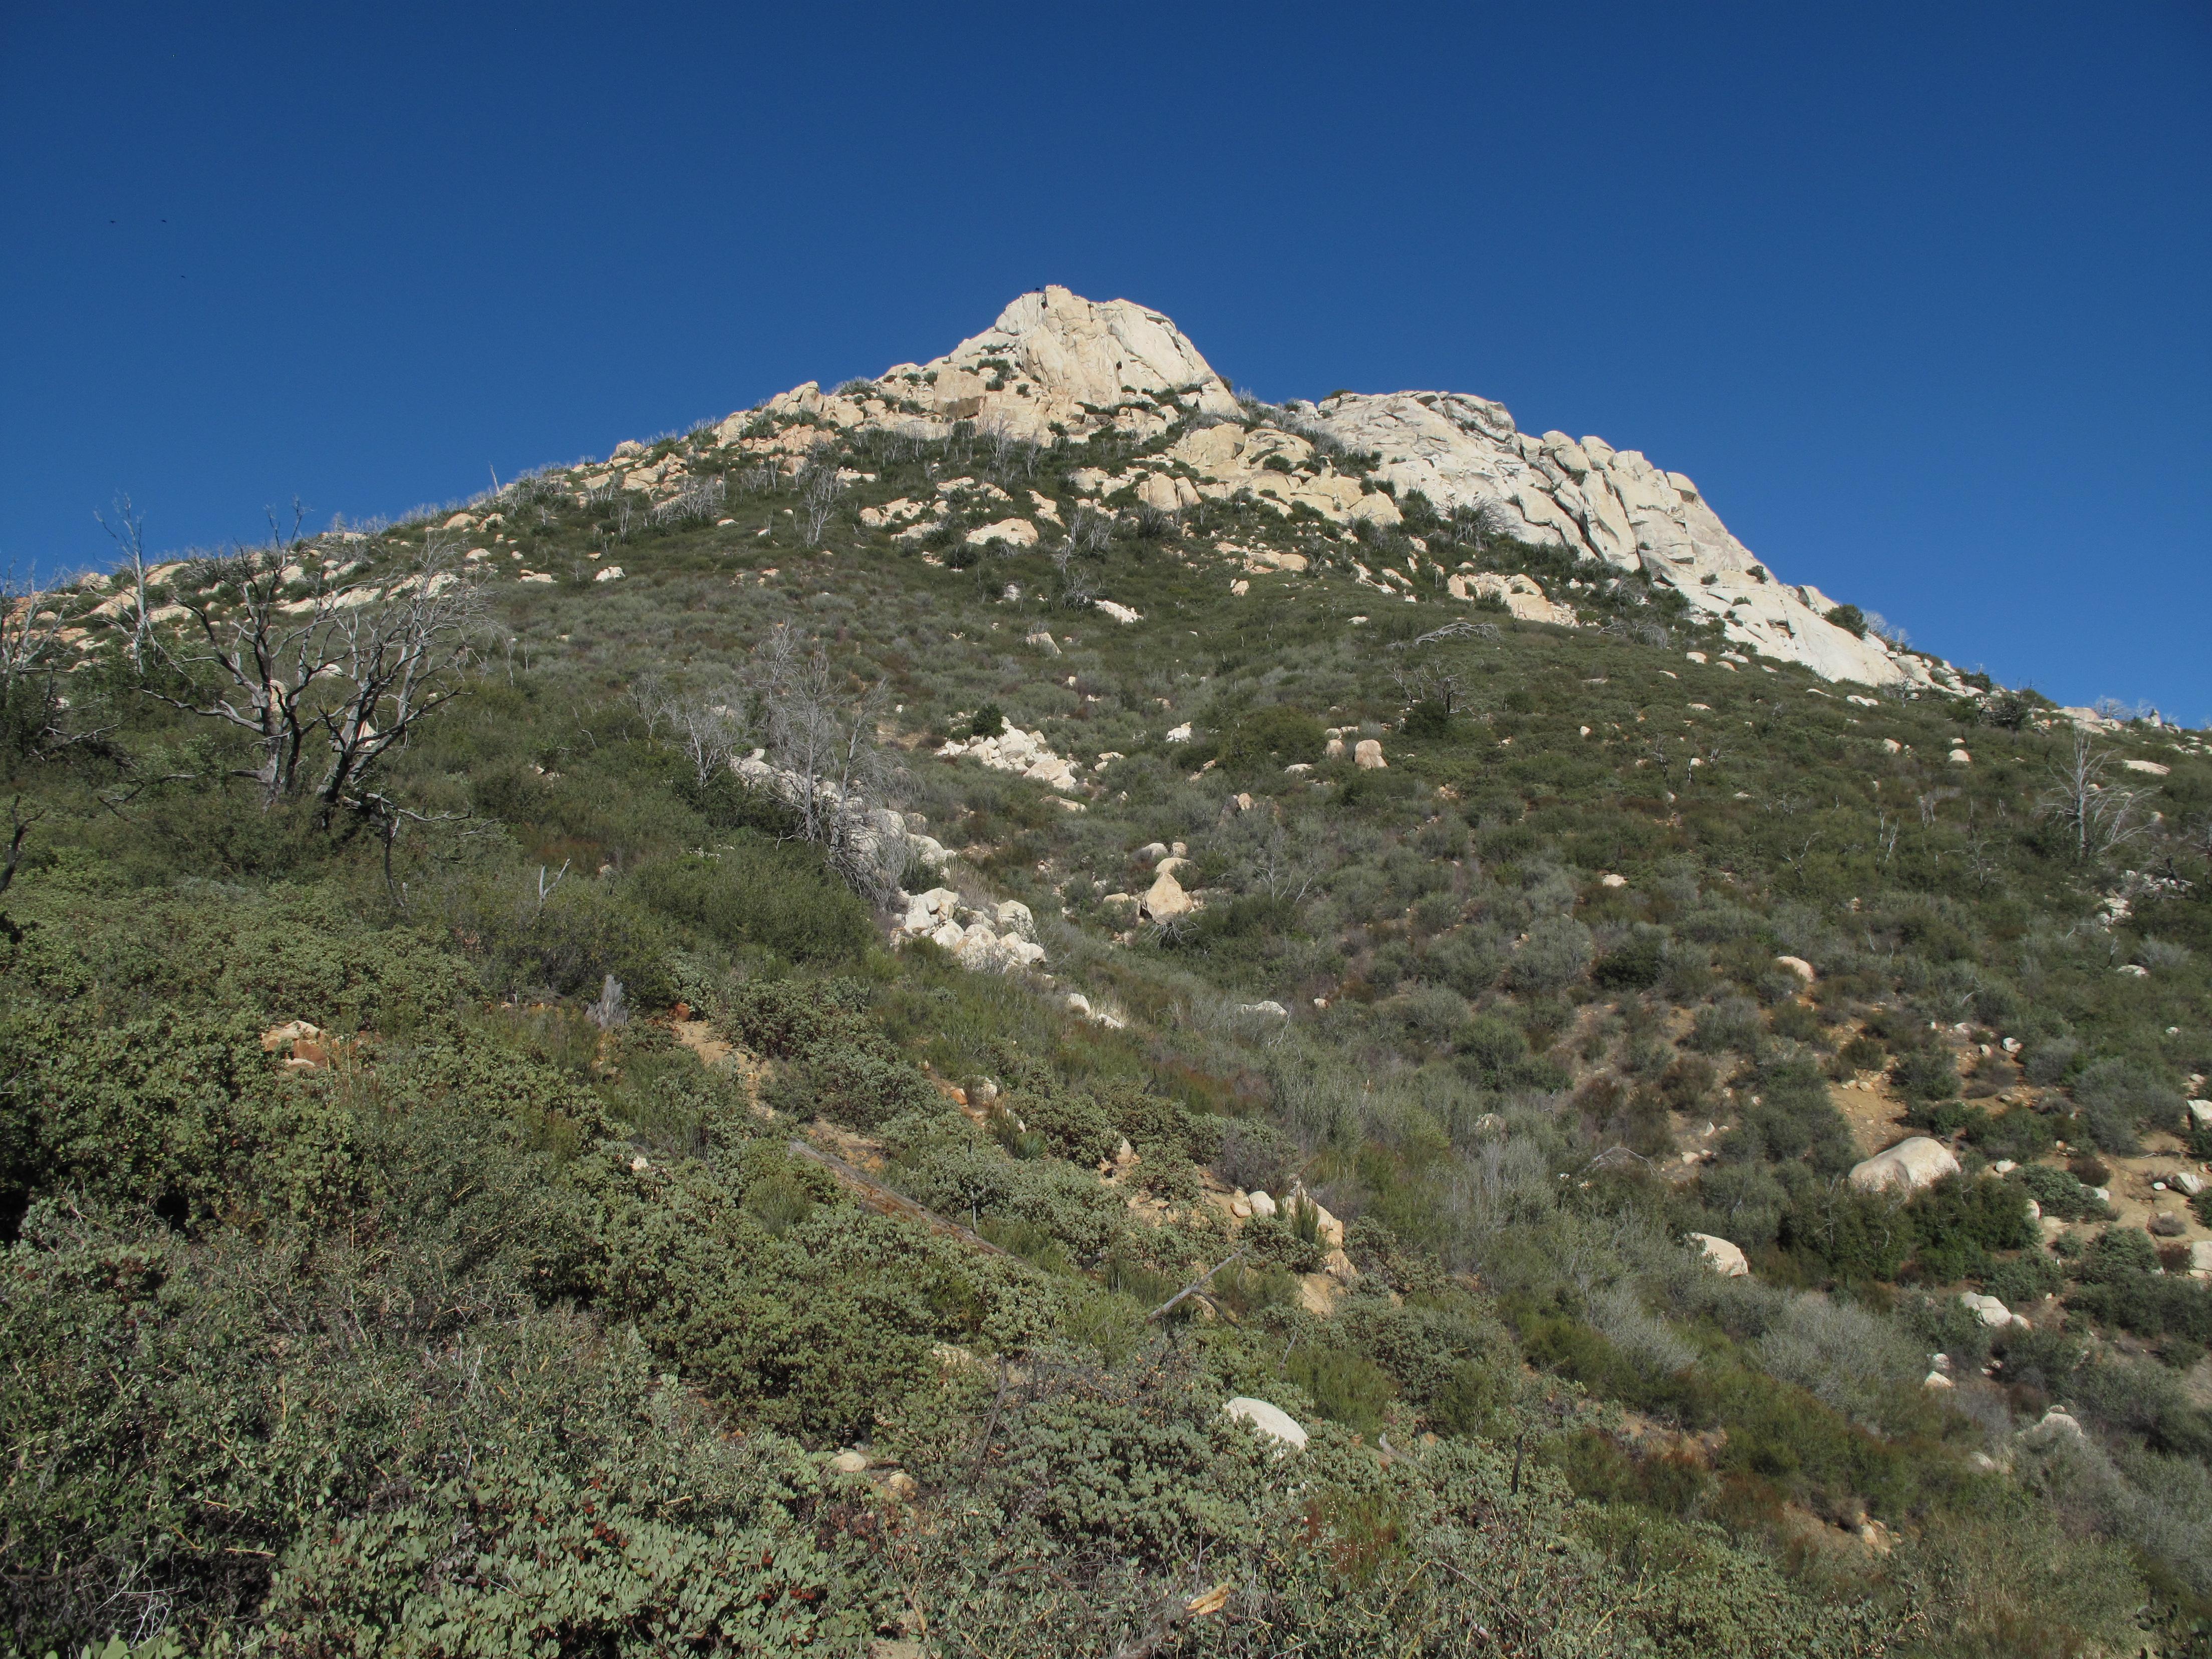 Stonewall Peak Elevation : Sota activation stonewall peak san diego county